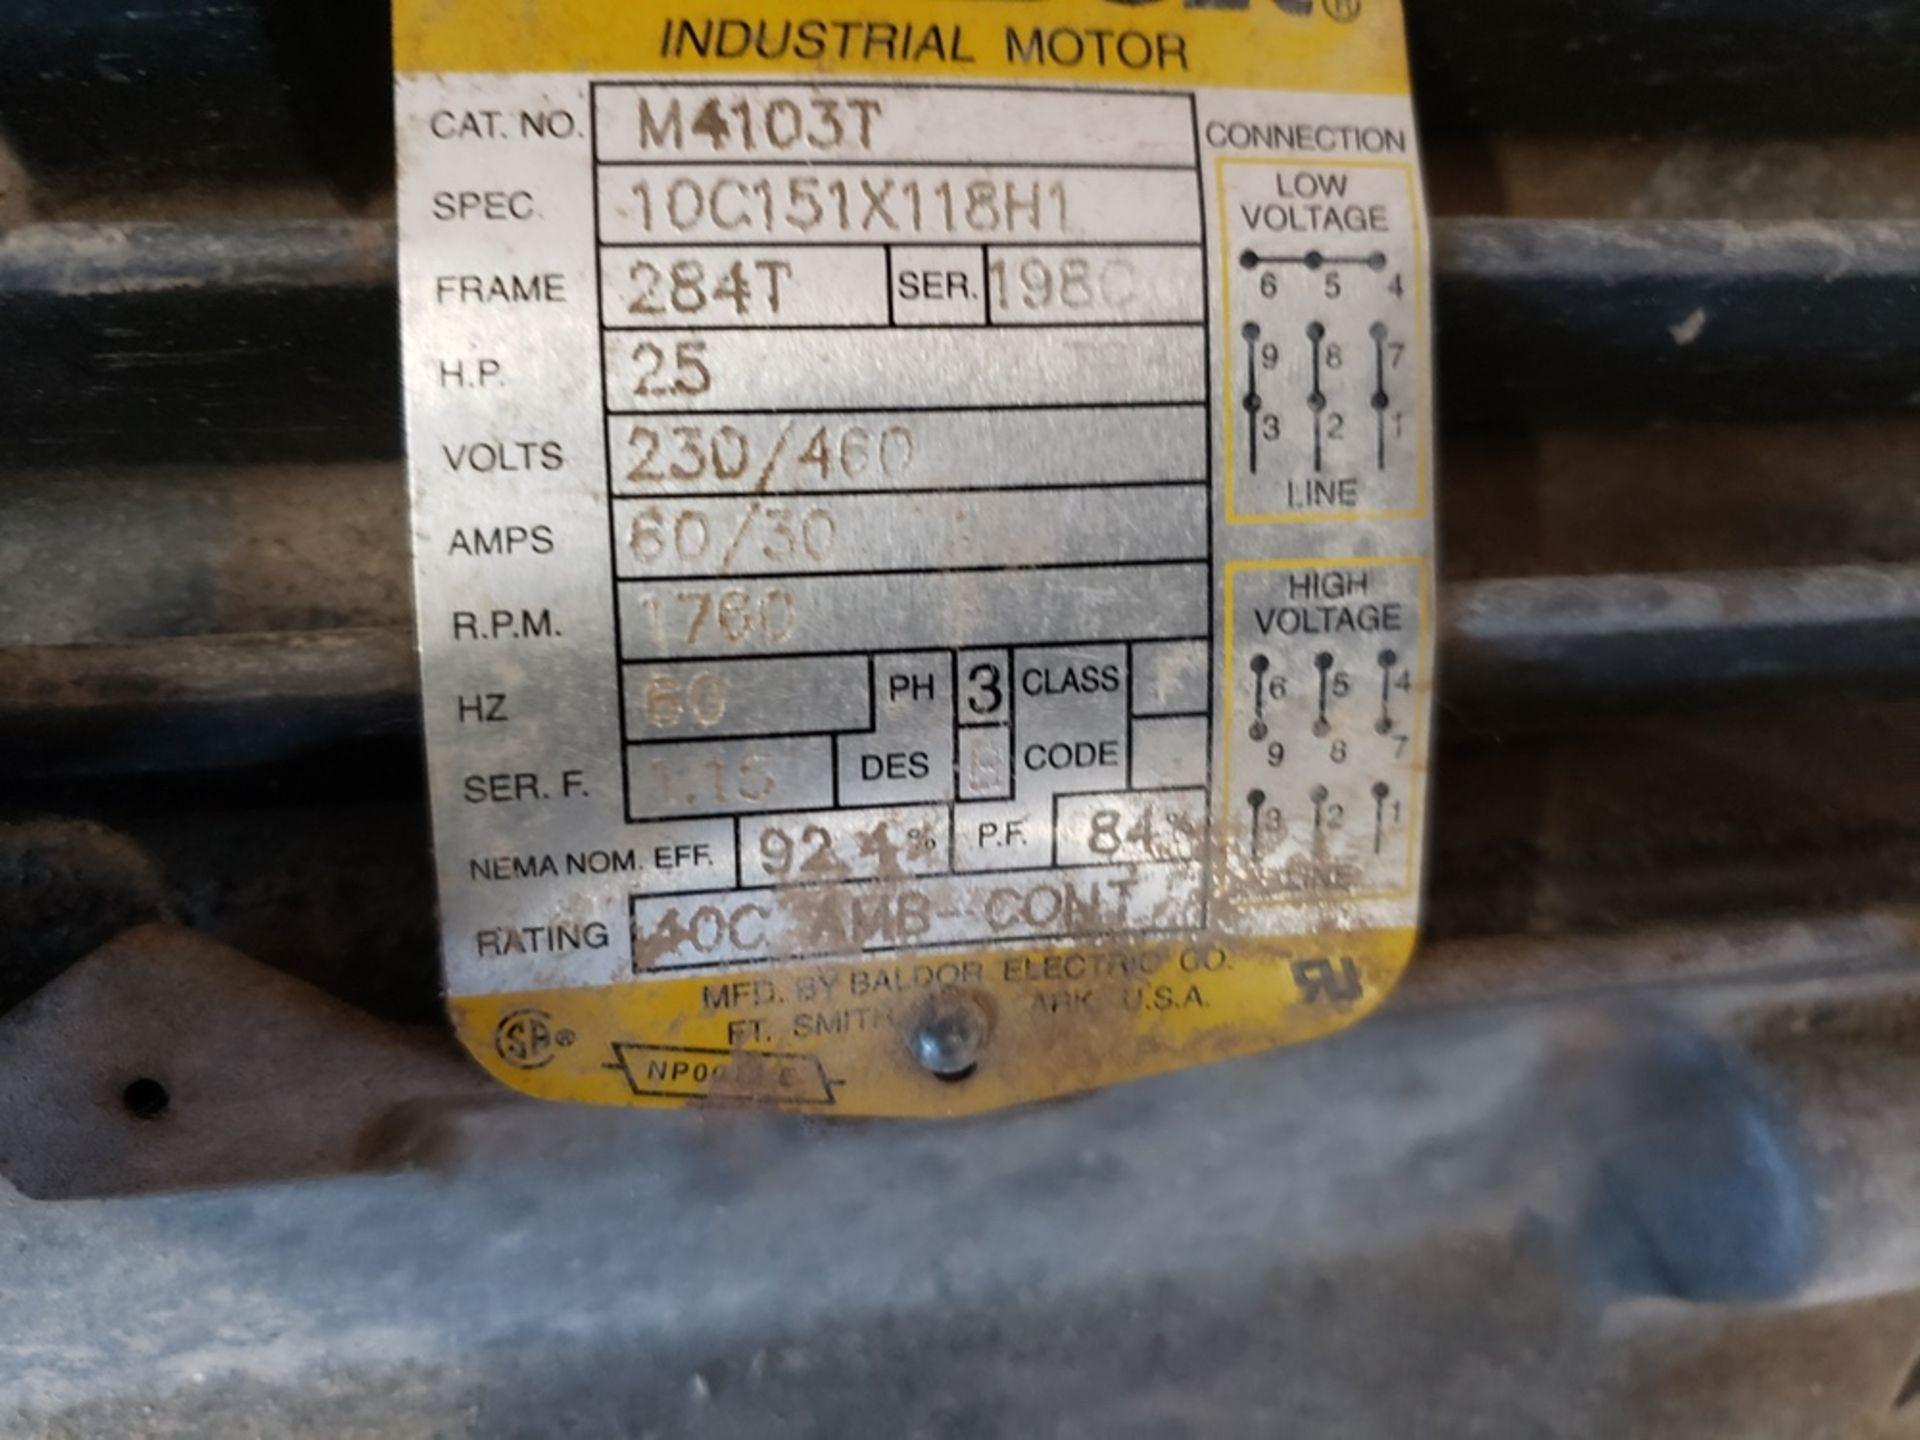 Lot 311 - 25 HP Blower Skid | Rig Fee: $400